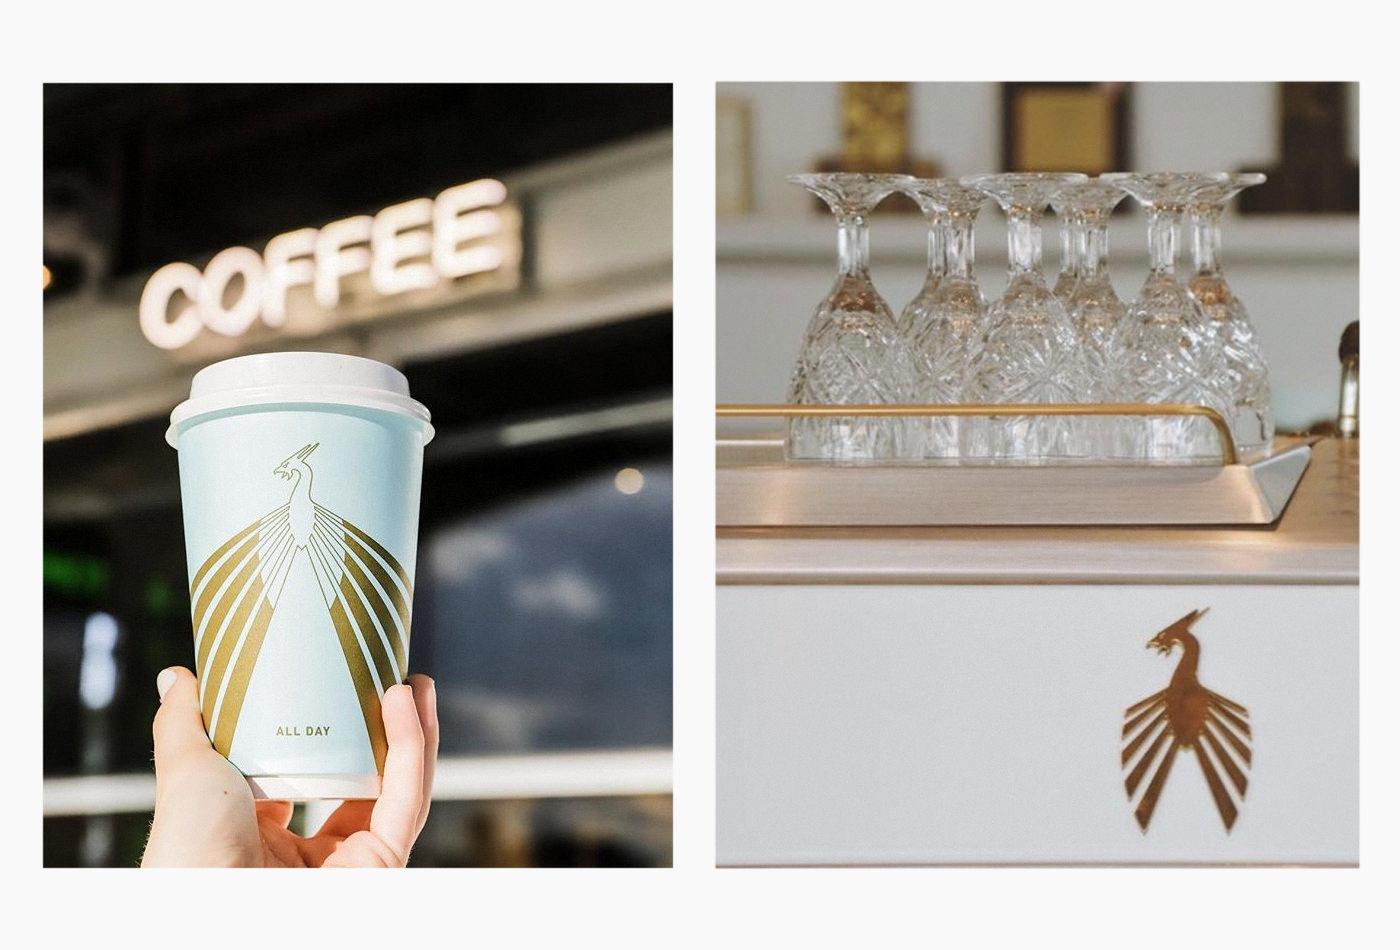 dragon-alldaymia-all-day-miami-coffee-cafe-brand-south-beach-florida